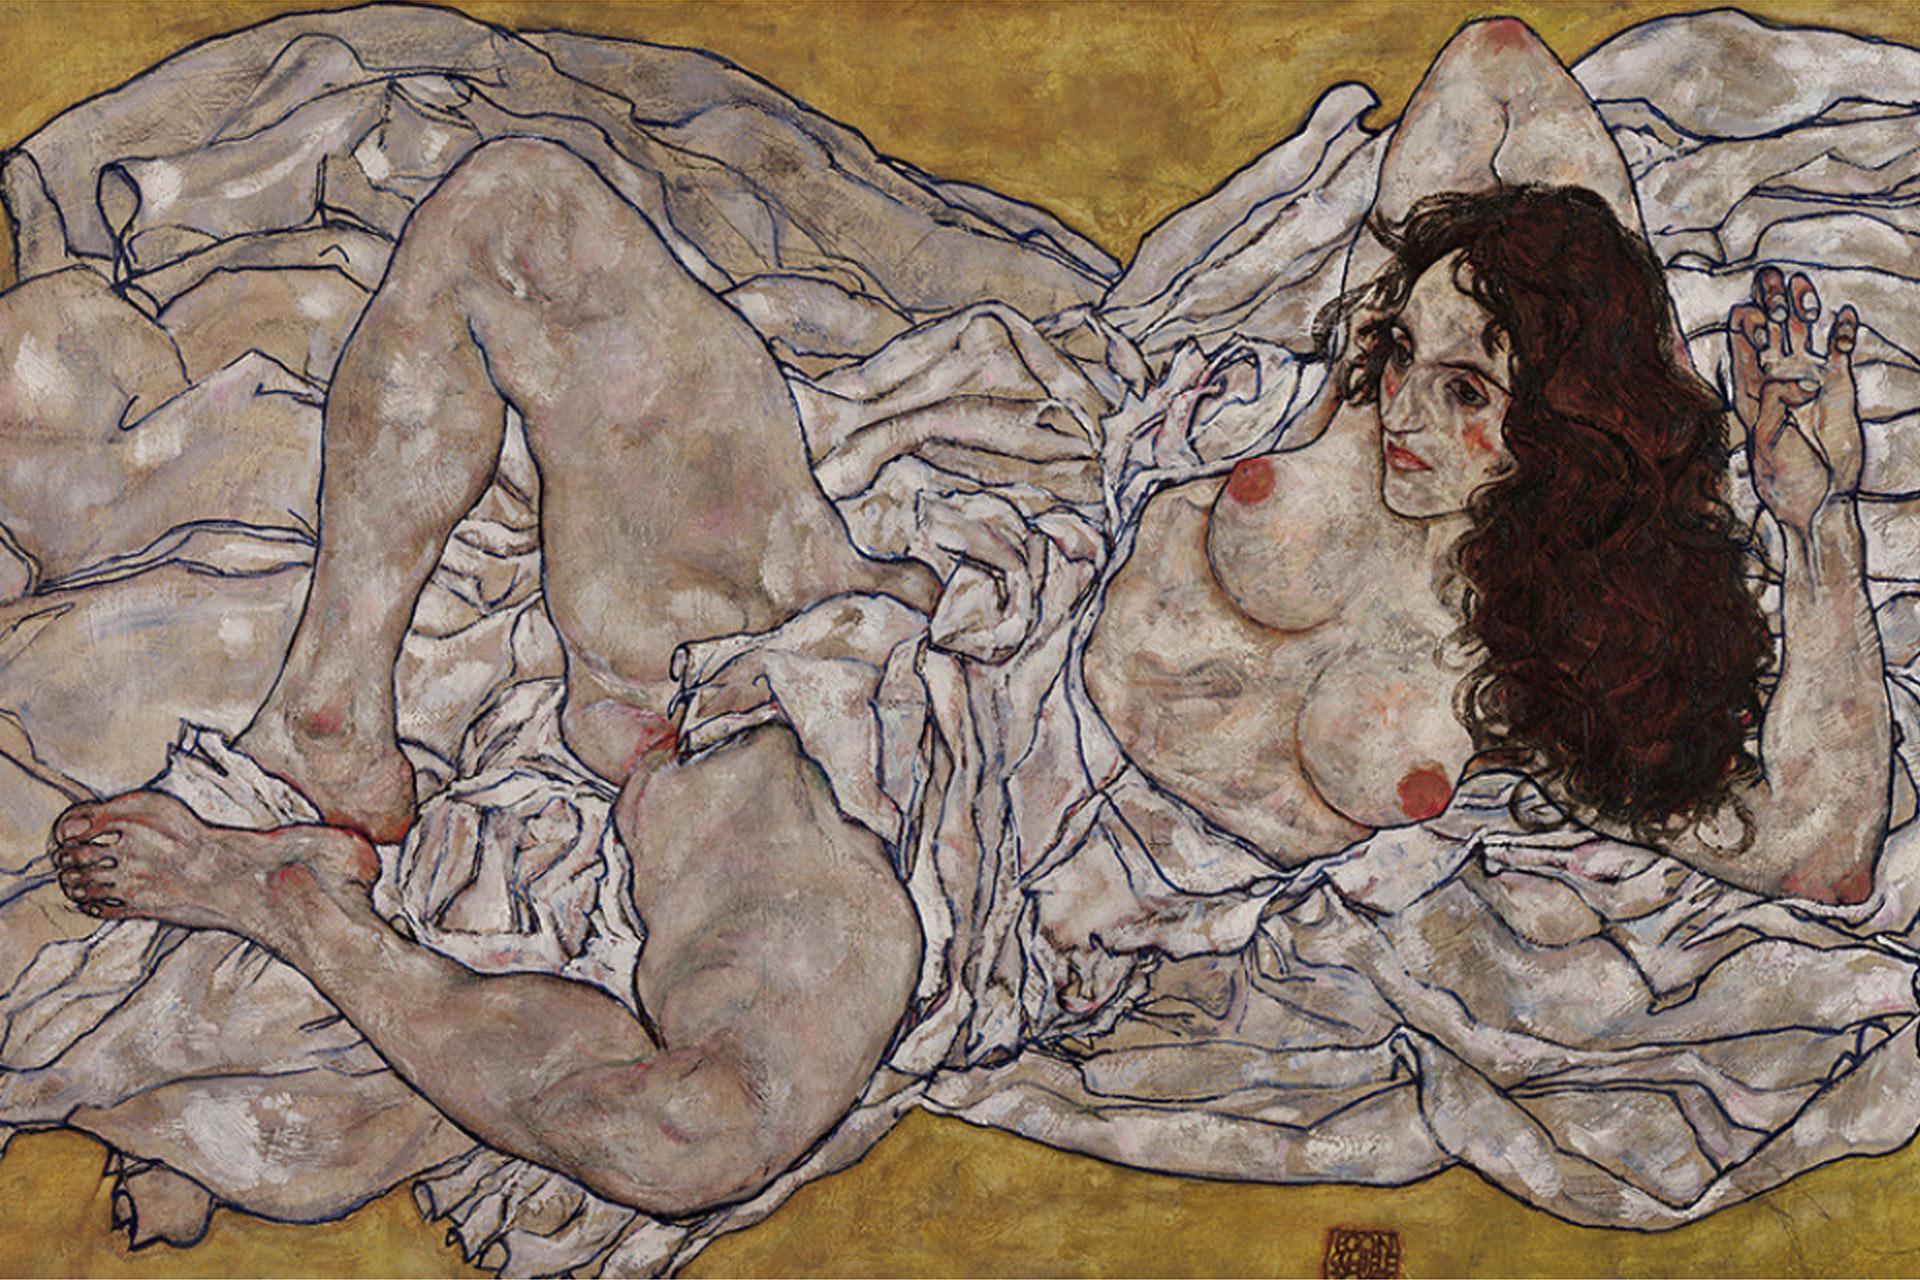 the radical nude Egon Schiele